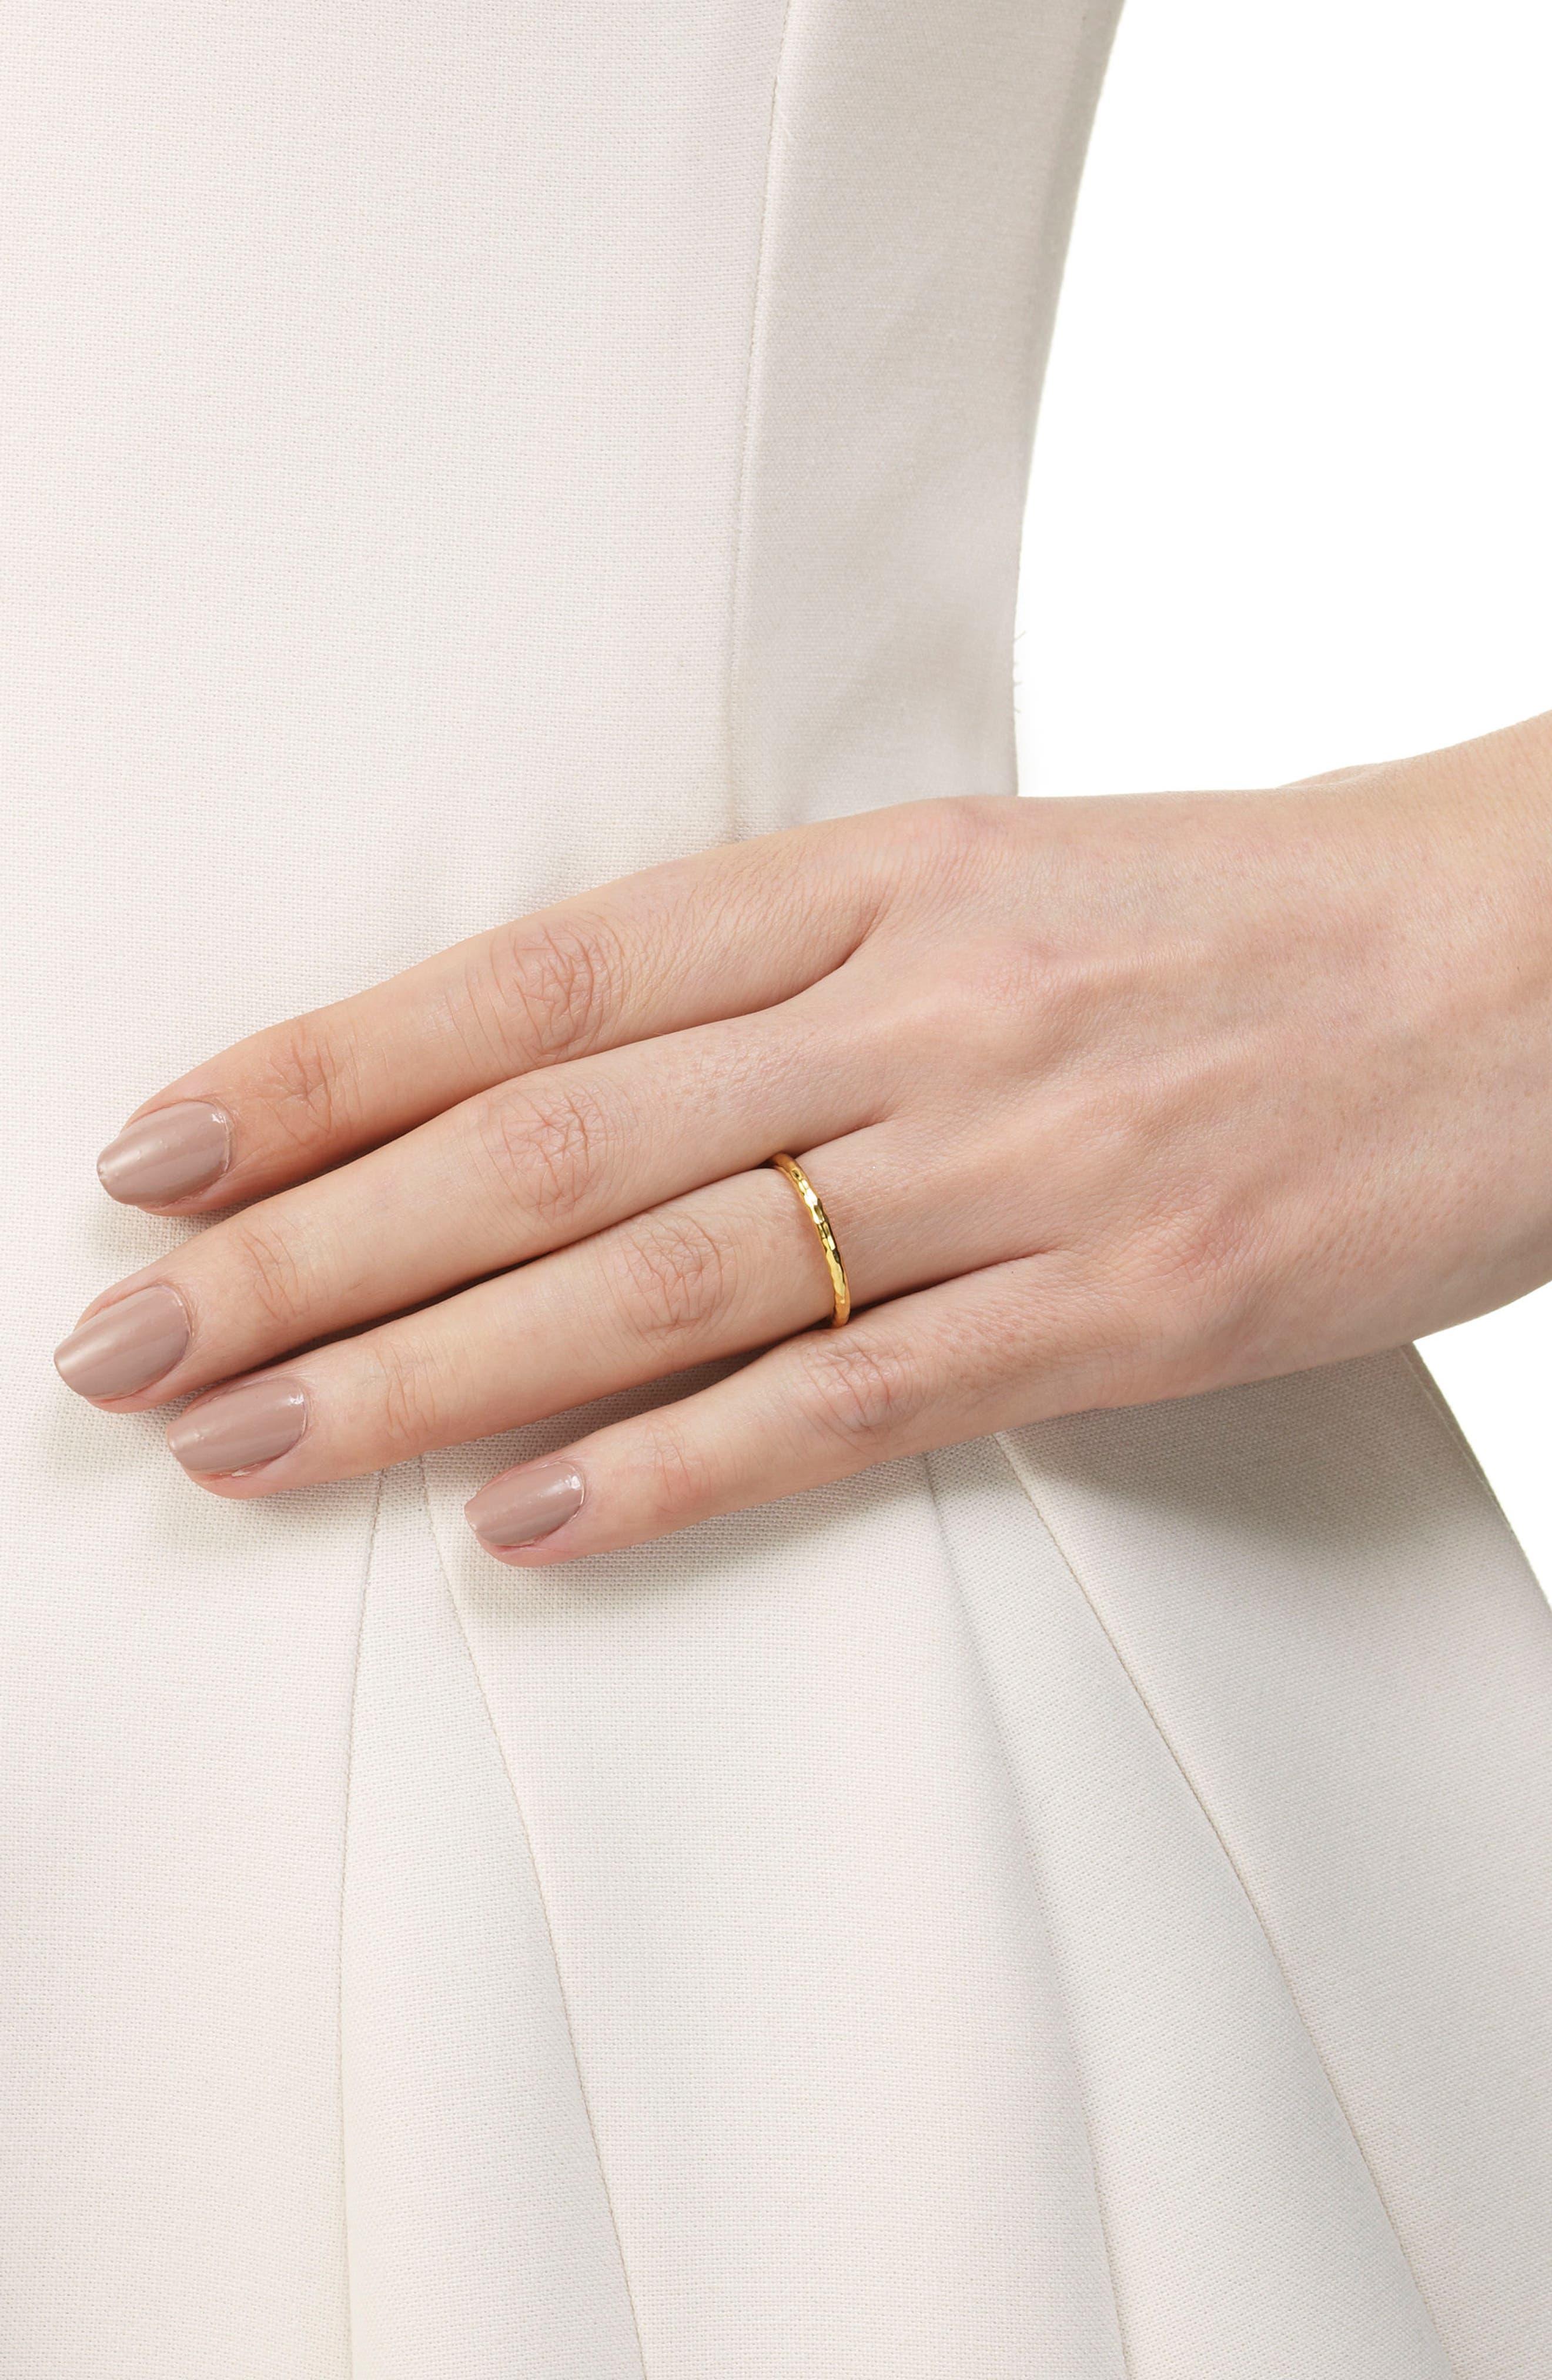 MONICA VINADER, Siren Hammered Ring, Alternate thumbnail 4, color, GOLD